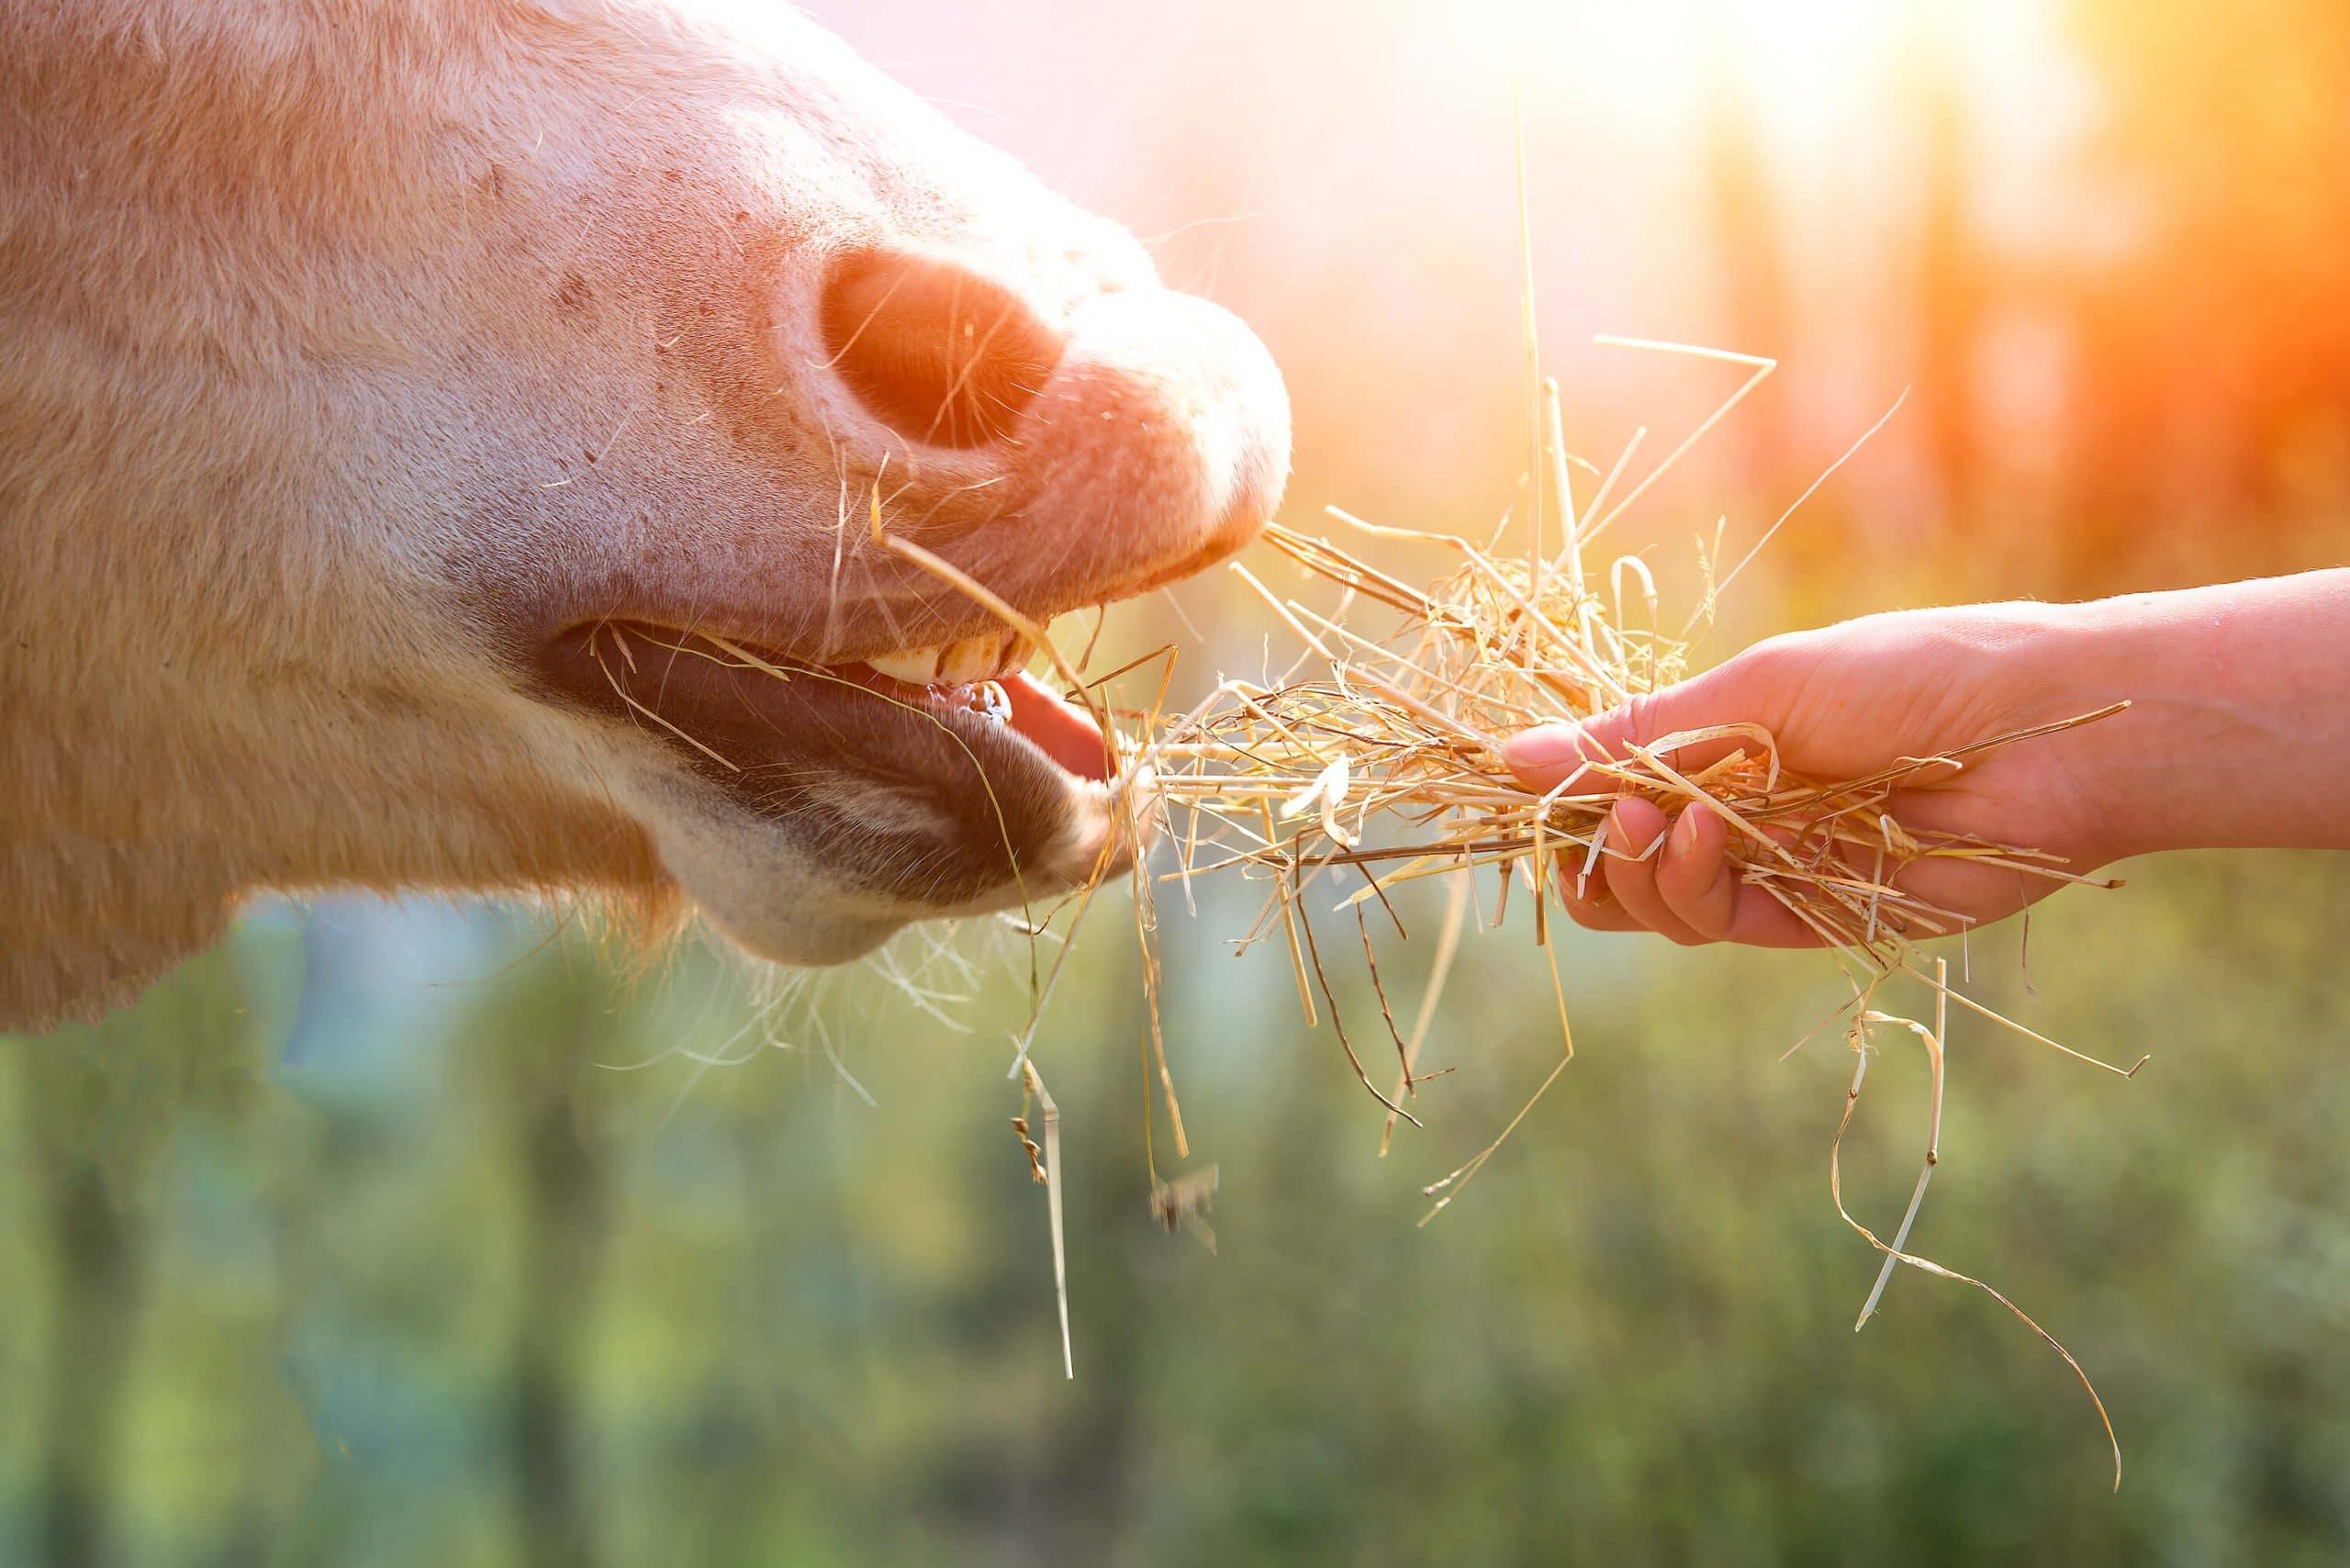 horse eating hay - CEN Nutrition Fibre Article